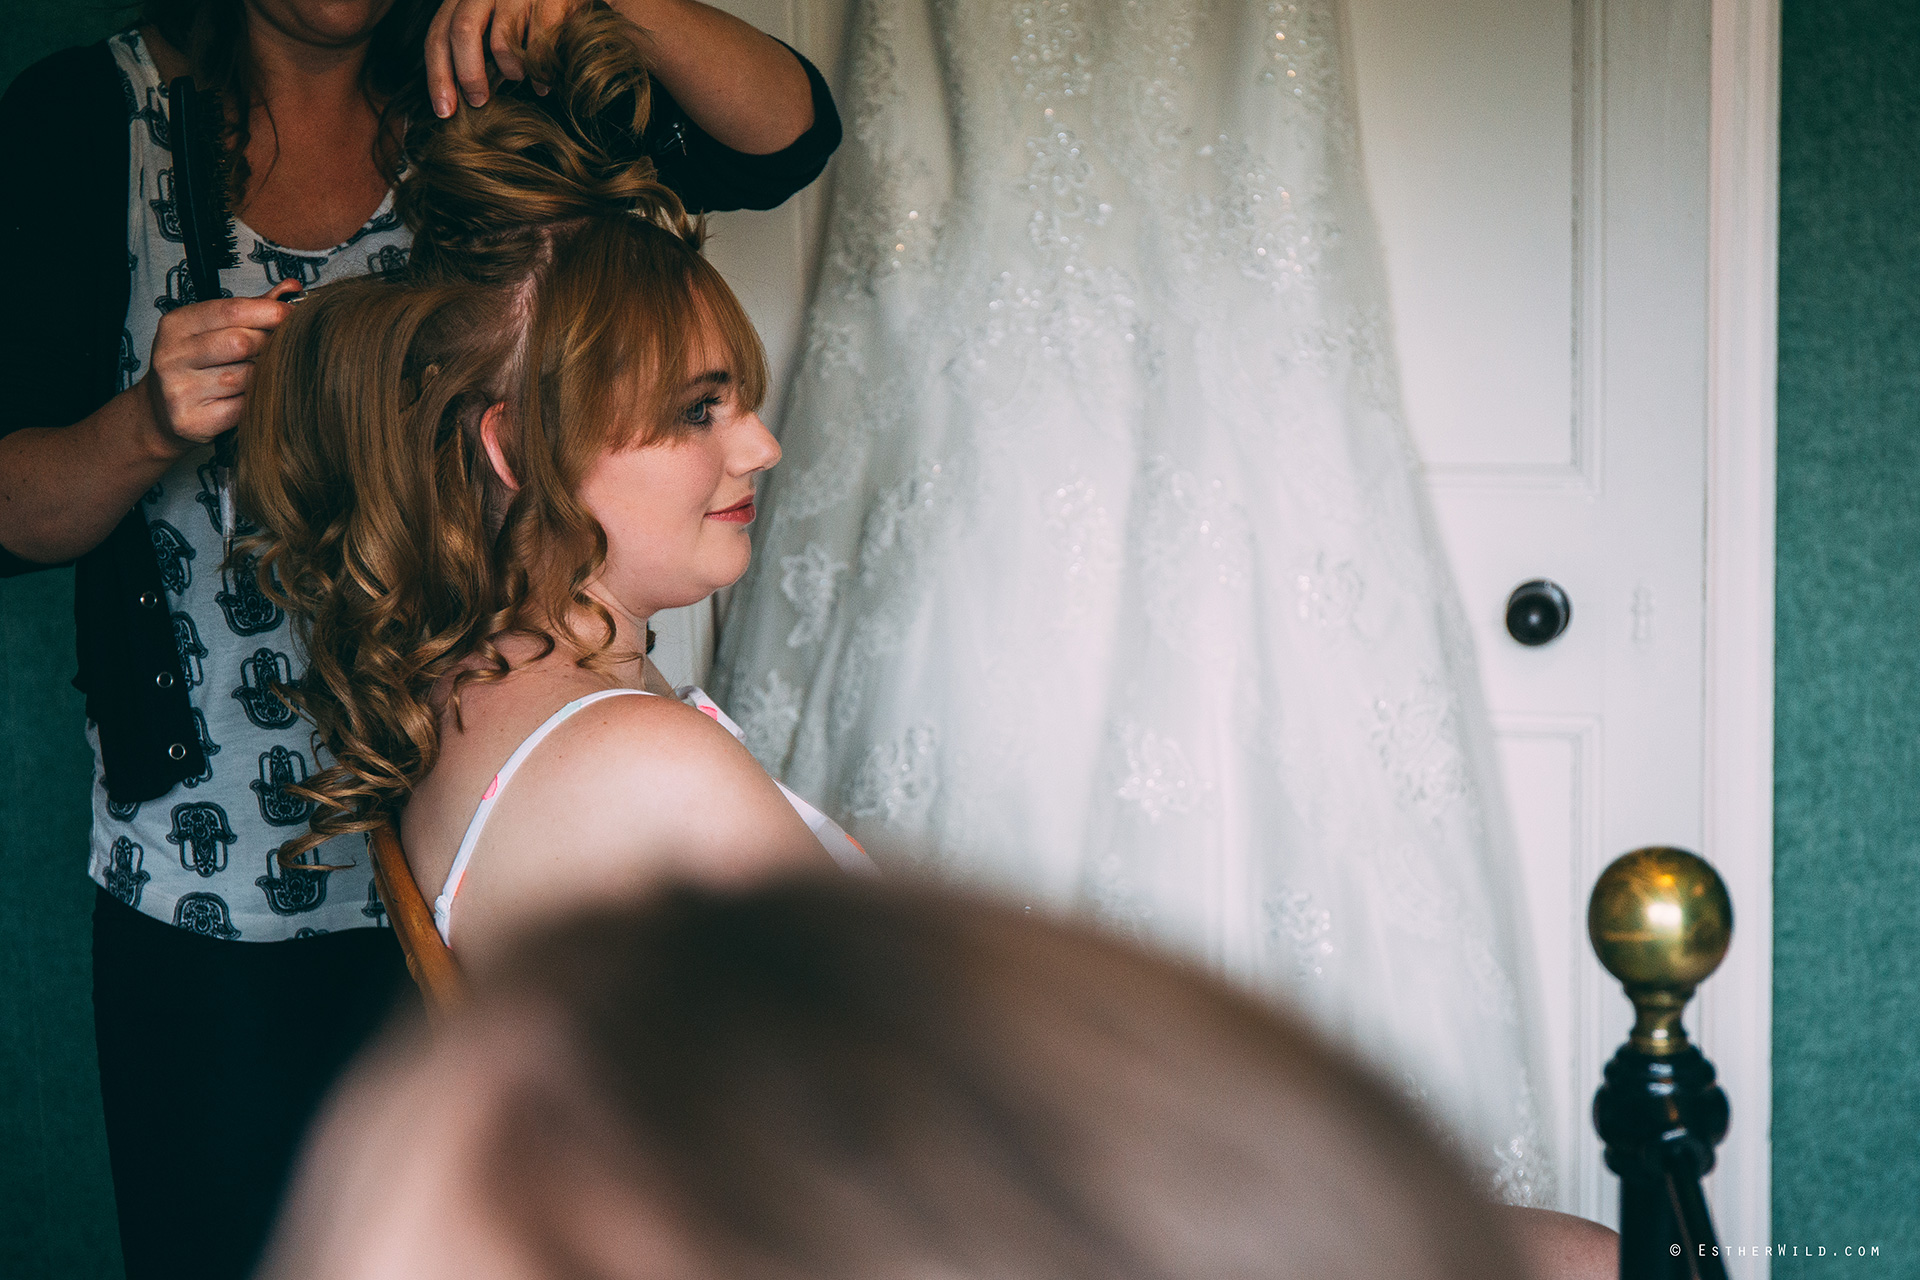 Norfolk_Wedding_Photographer_Mannington_Hall_Country_Esther_Wild_9859.jpg